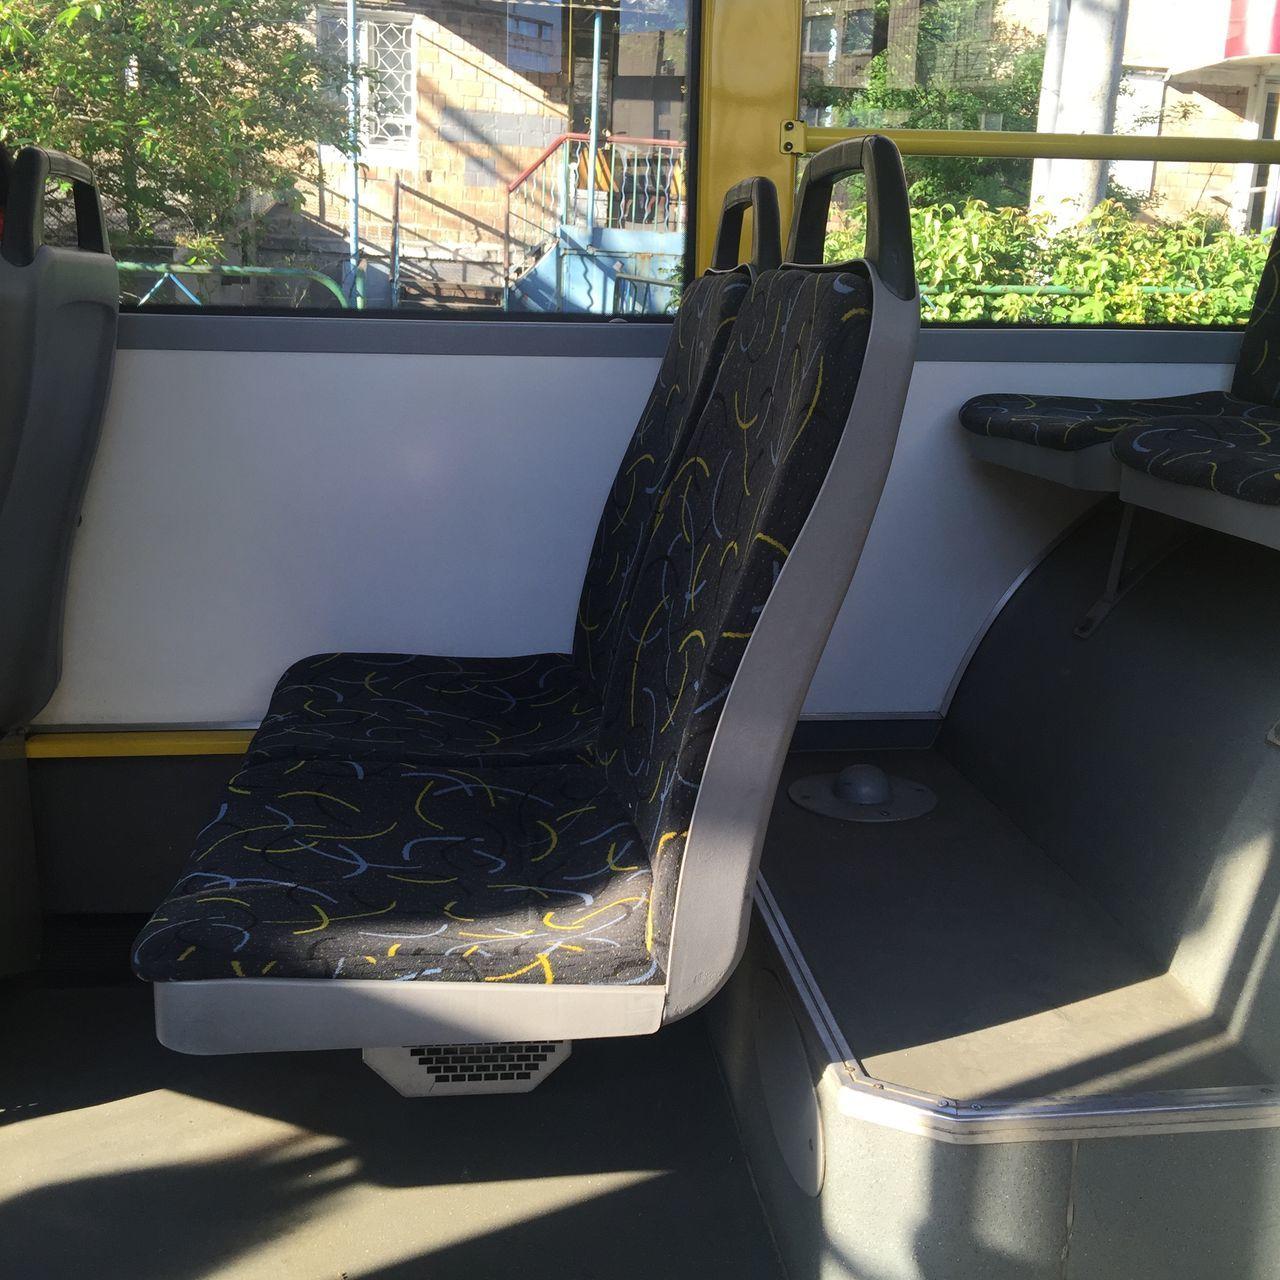 vehicle interior, no people, vehicle seat, transportation, mode of transport, land vehicle, day, car, window, indoors, close-up, seat, tree